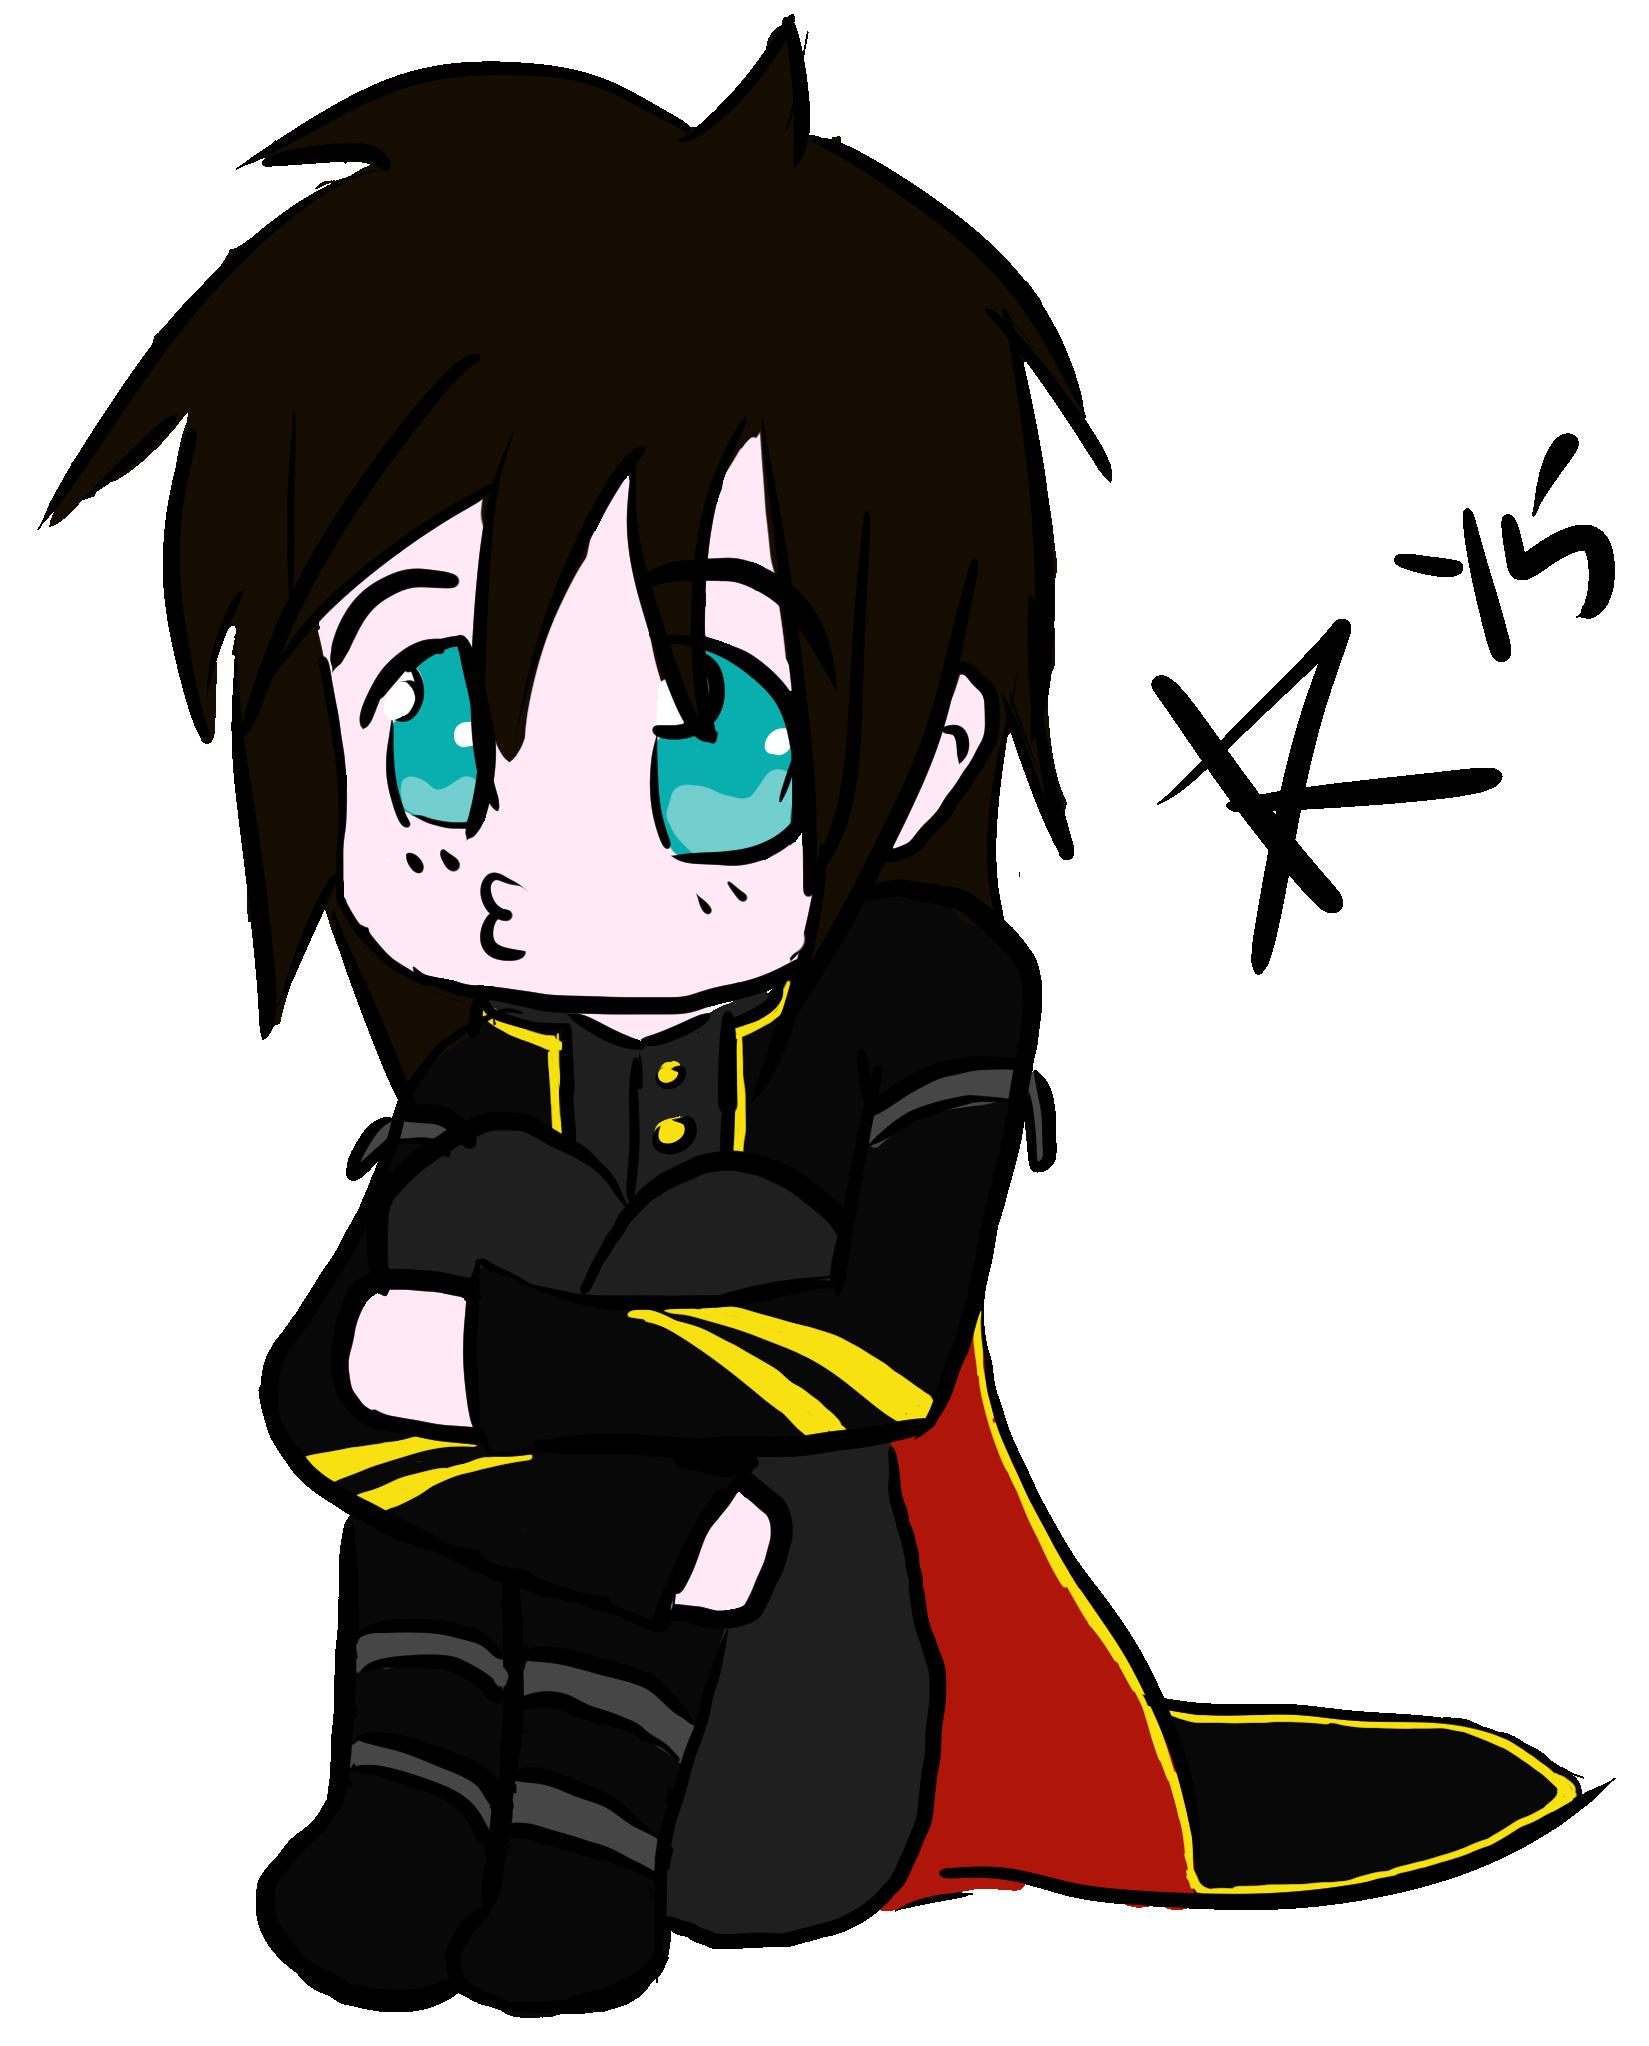 Prince Envy